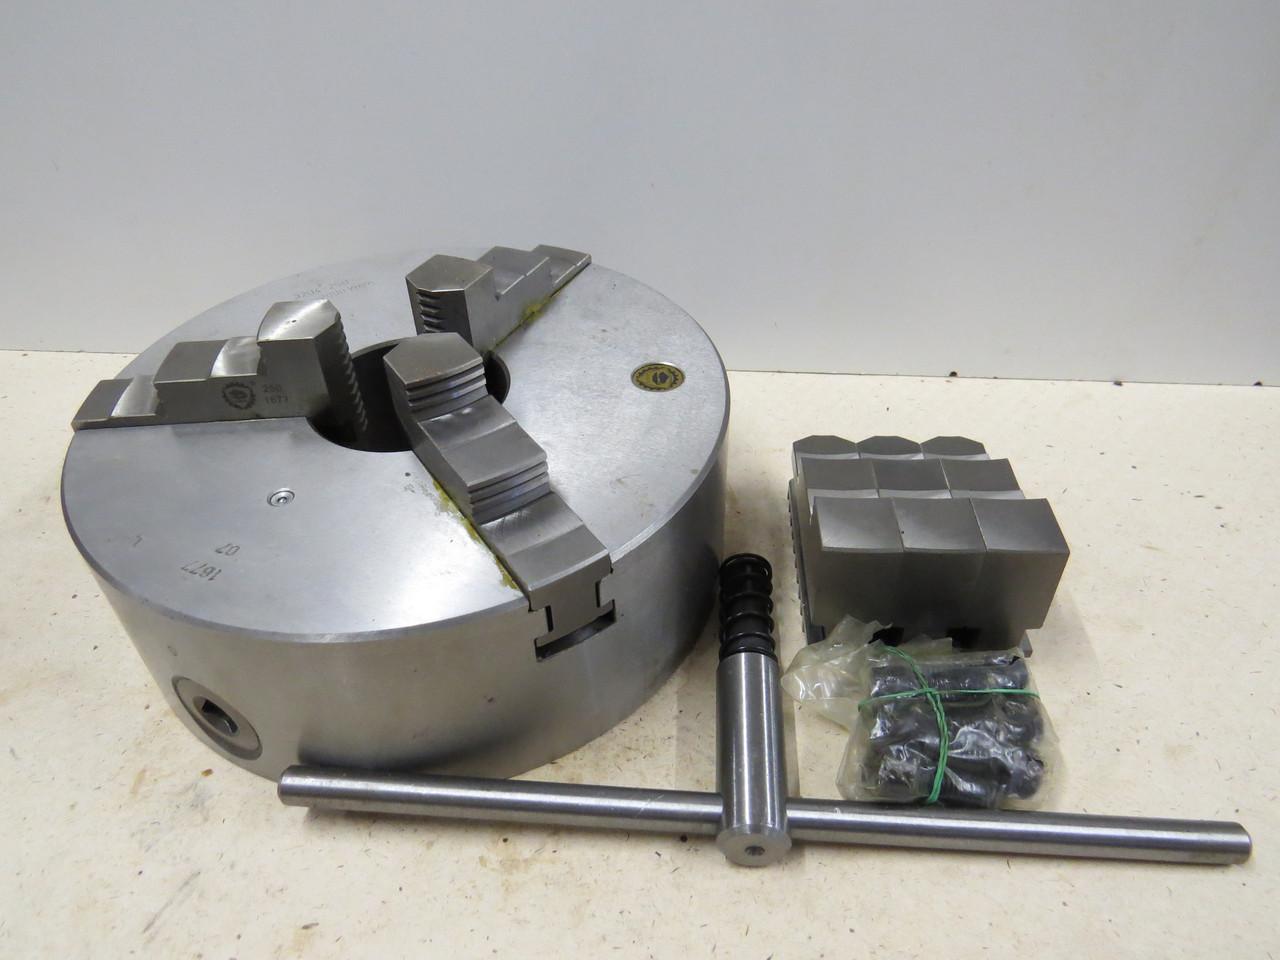 Патрон токарный 250мм 3-х кулачковый планшайба 3204 BISON-BIAL Чугун